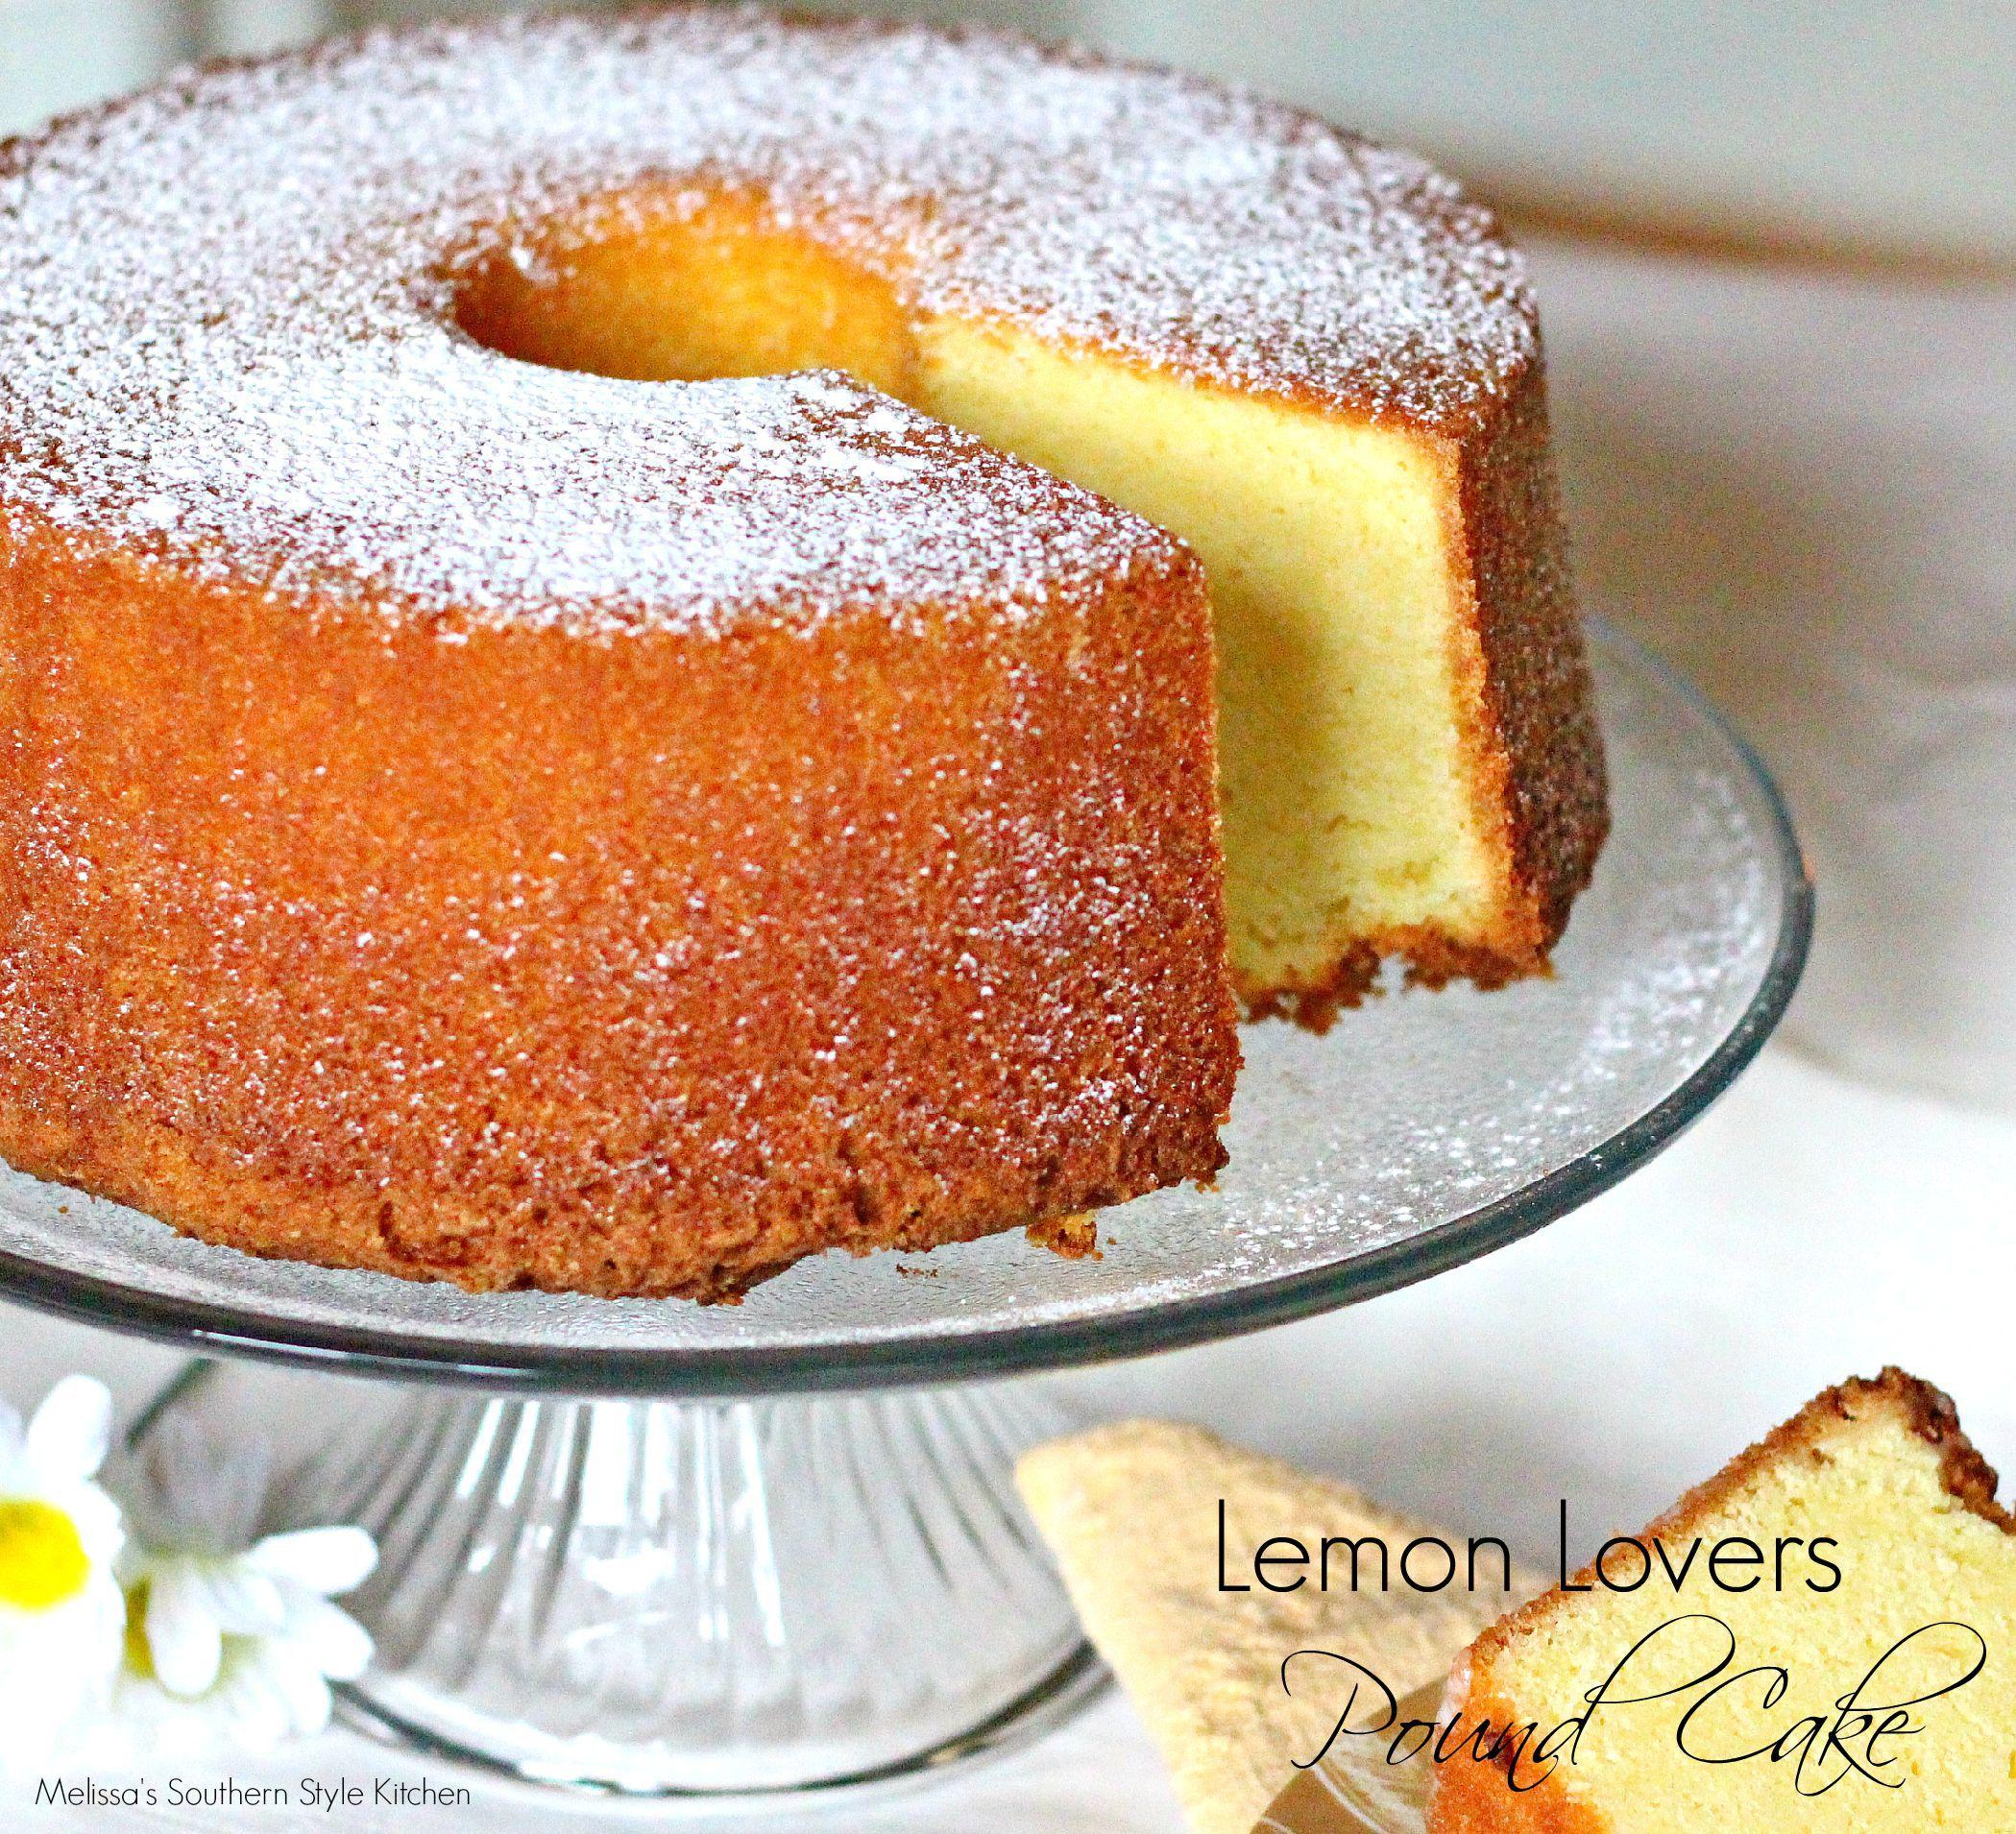 Lemon Lovers Pound Cake Melissassouthernstylekitchen Com Lemon Pound Cake Recipe Savoury Cake Cake Recipes